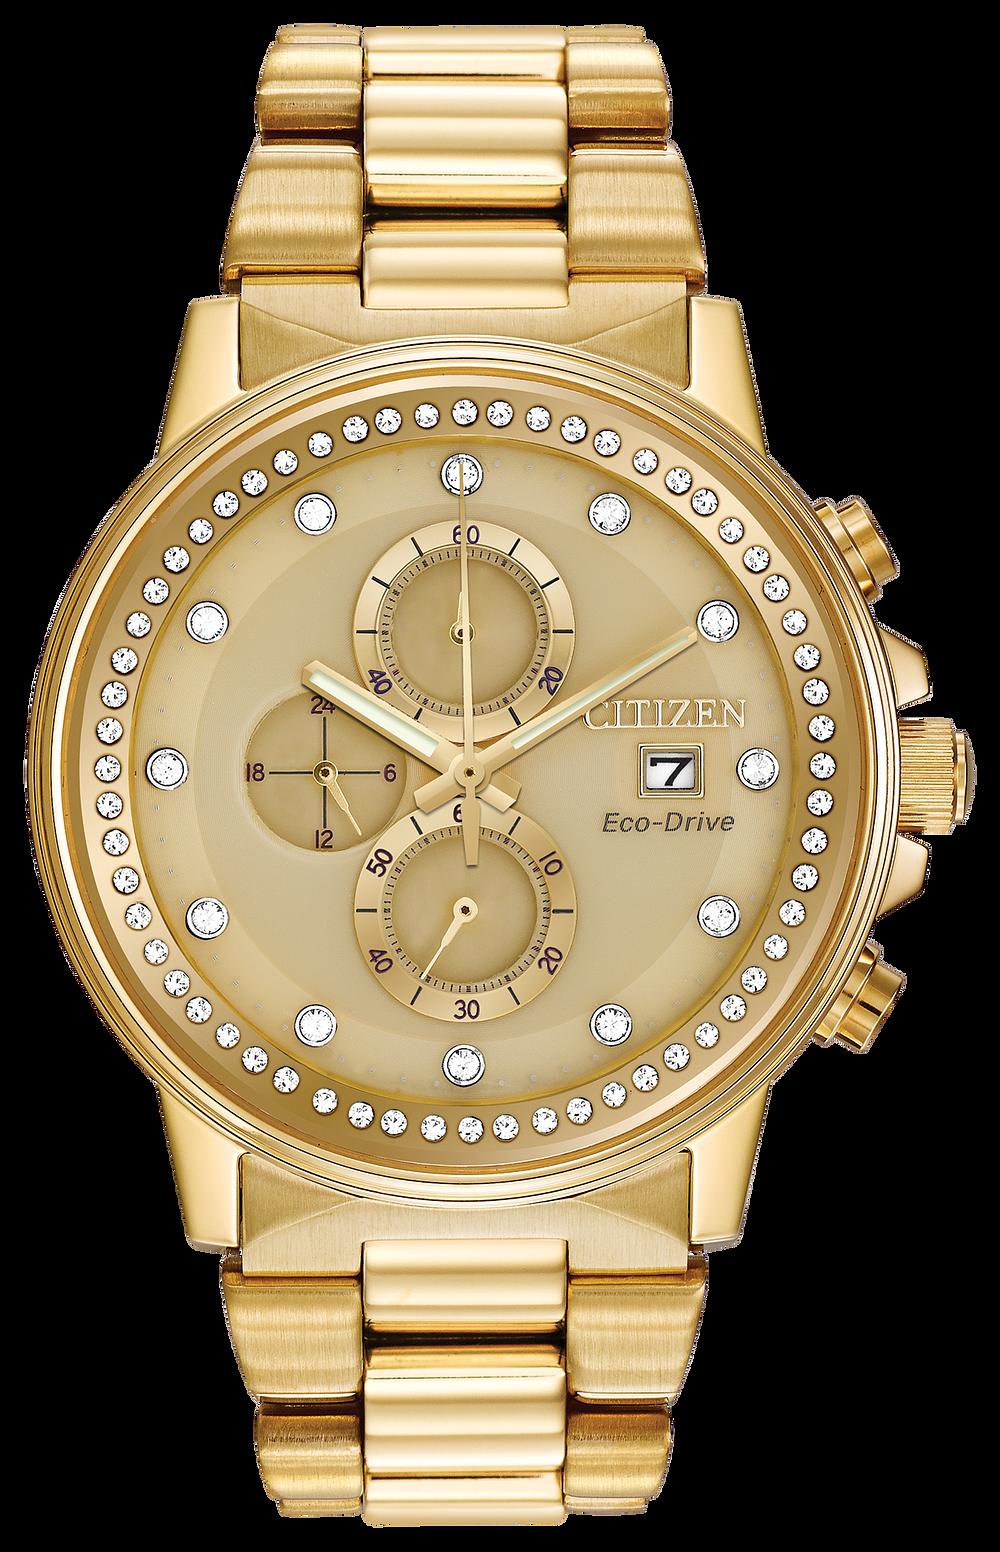 Mens Citizen Gold Watch - ebay.co.uk